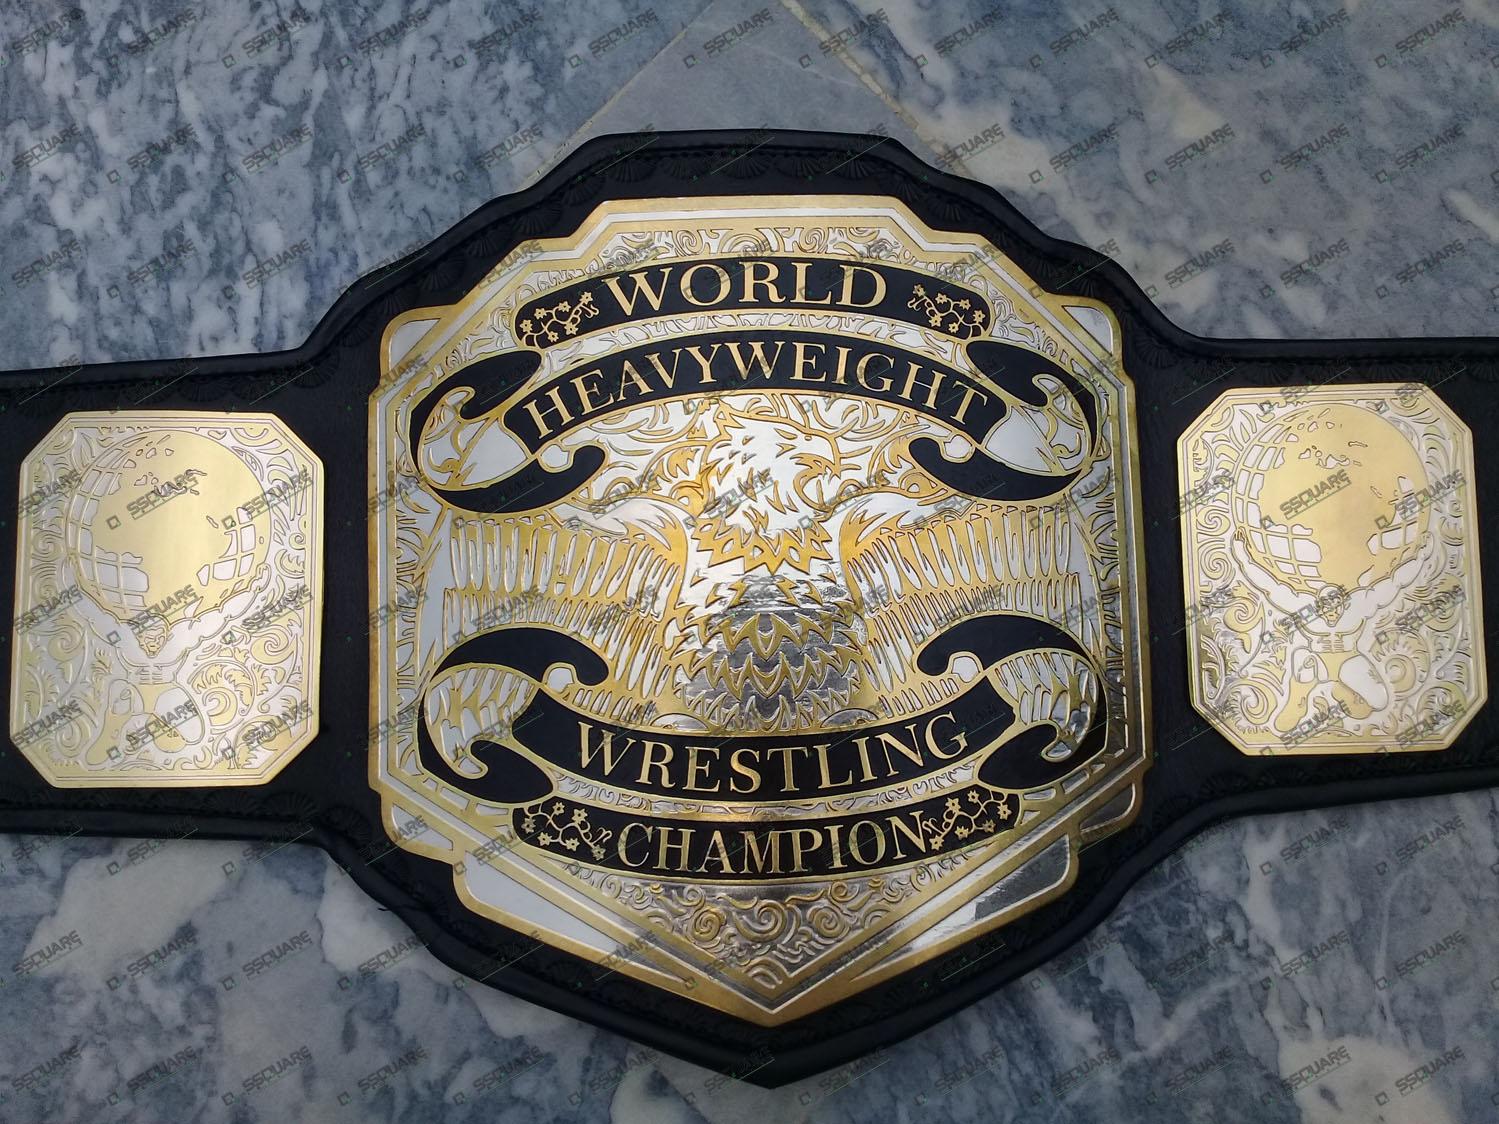 World Heavyweight Wrestling Champion replica belt